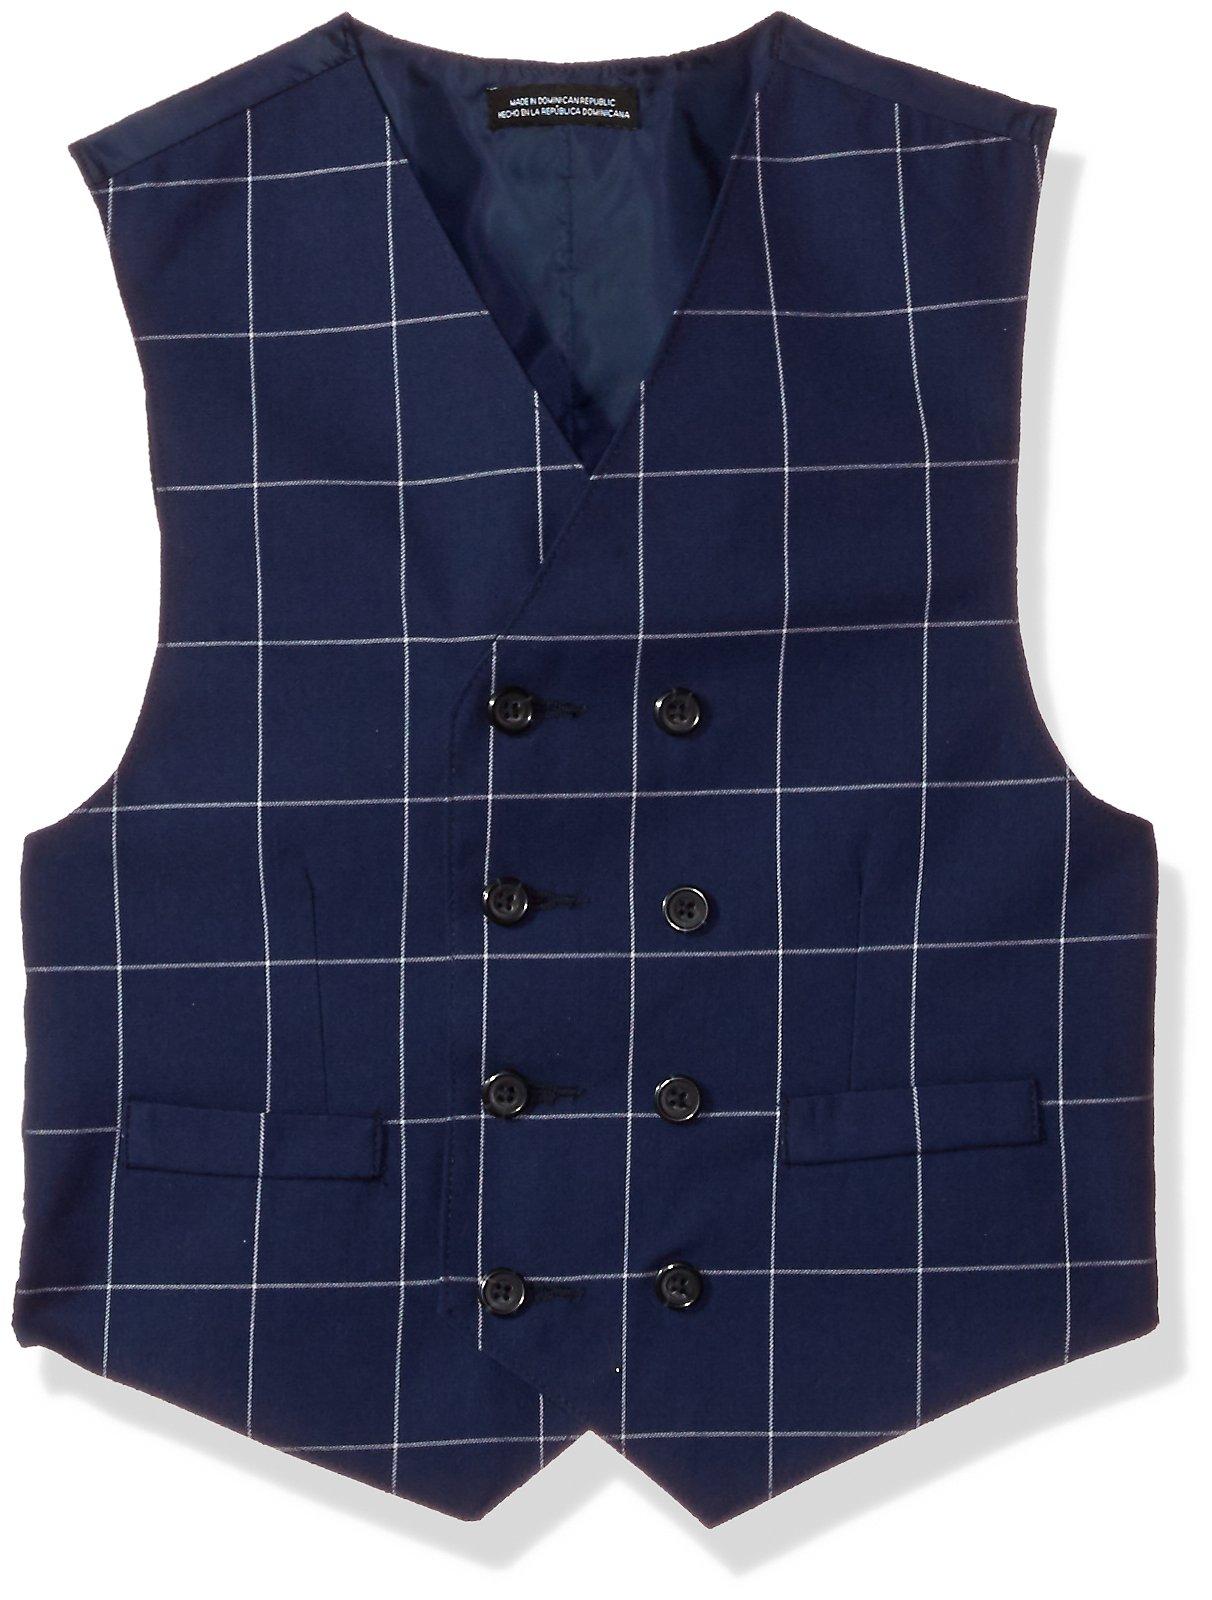 Steve Harvey Big Boys' Three Piece Suit Set, Dark Blue Windowpane, 16 by Steve Harvey (Image #3)